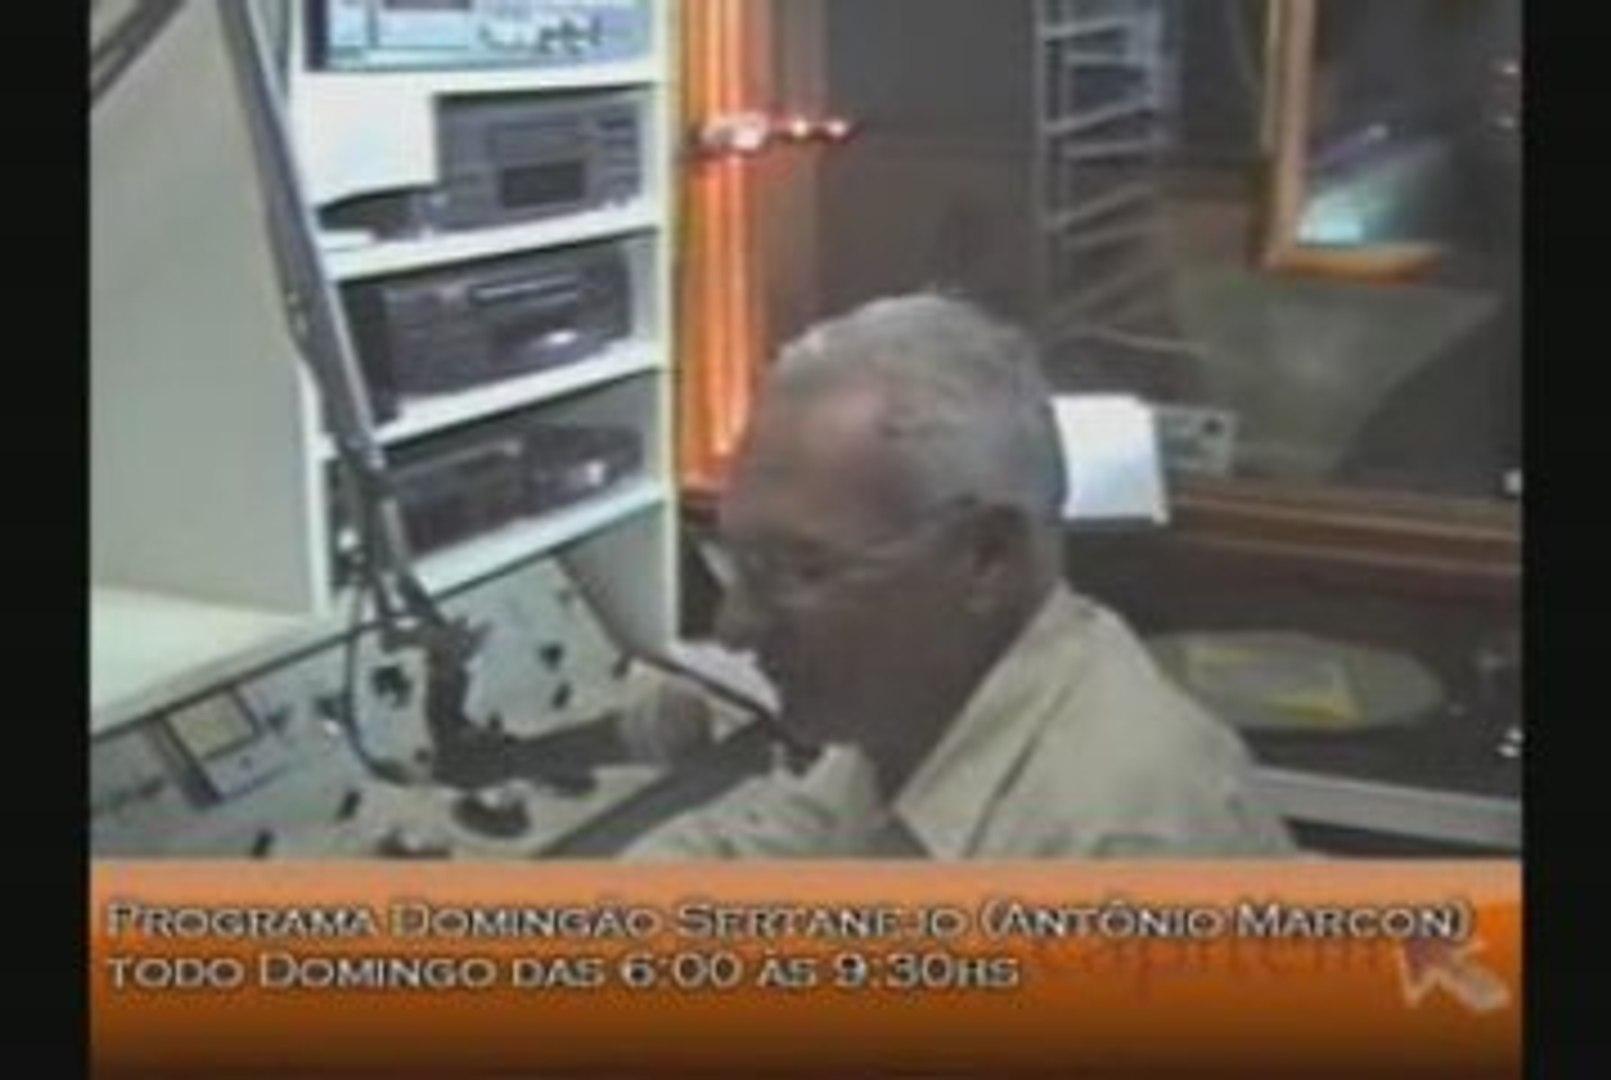 Programa Domingão Sertanejo (Antônio Marcon)